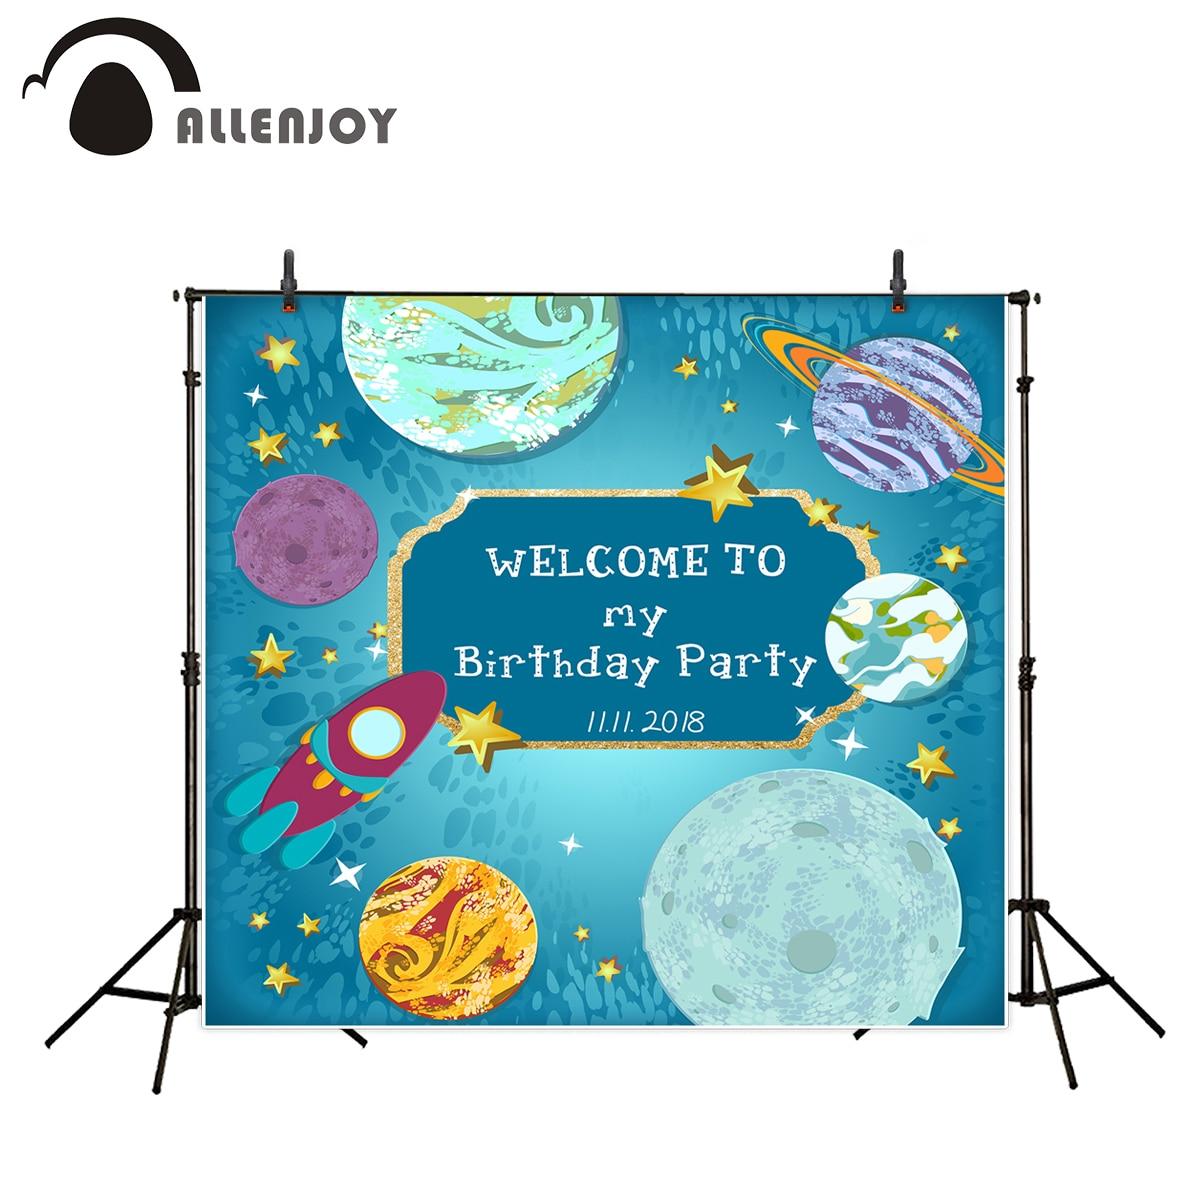 Allenjoy Vinyl photography Cosmic science fiction planet imagination child birthday photo booth backdrop photography backdrops the great science fiction